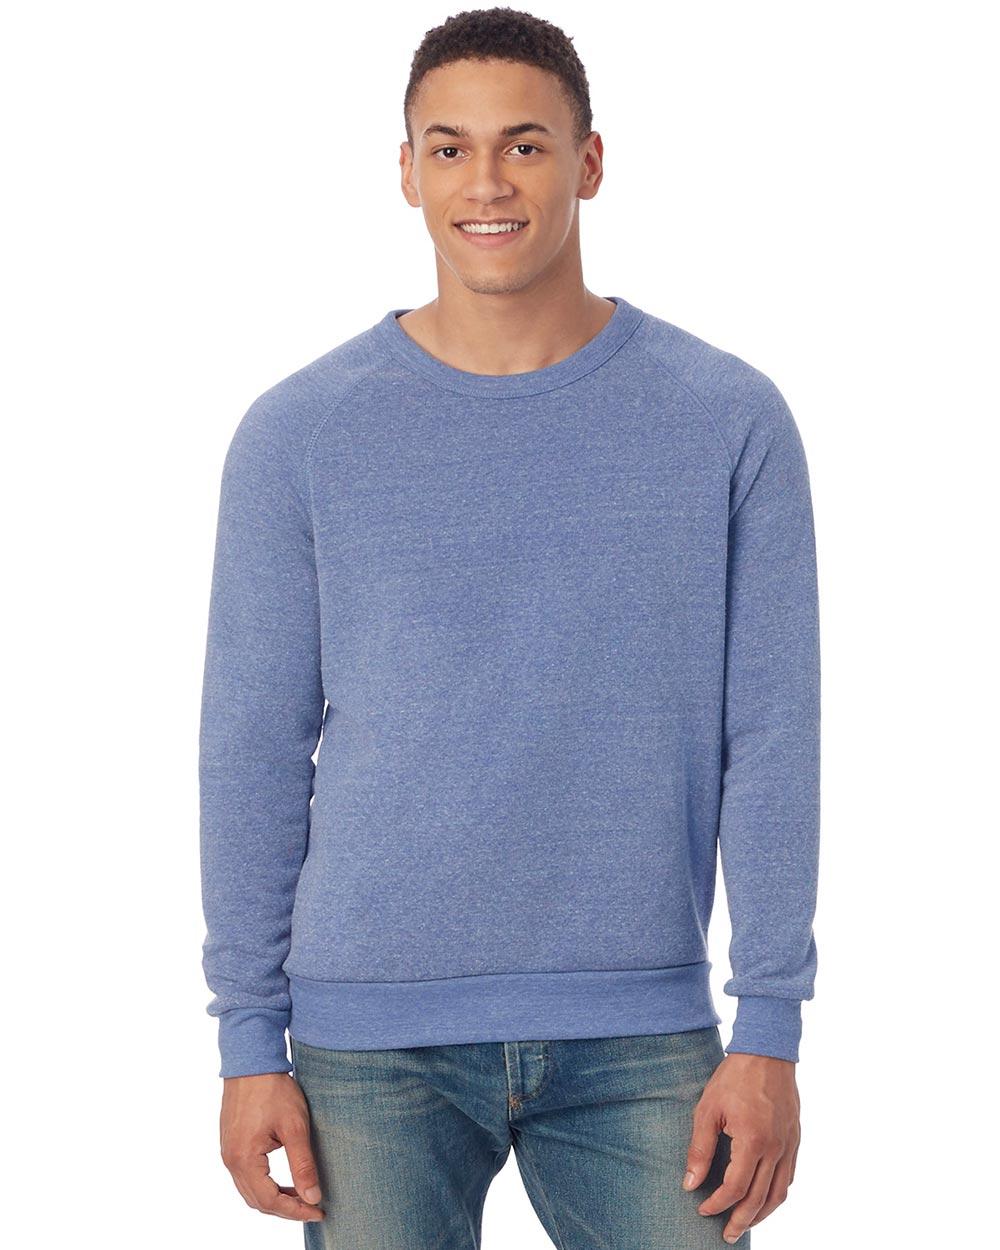 Alternative Apparel AA9575 - Unisex Champ Eco-Fleece Solid Sweatshirt